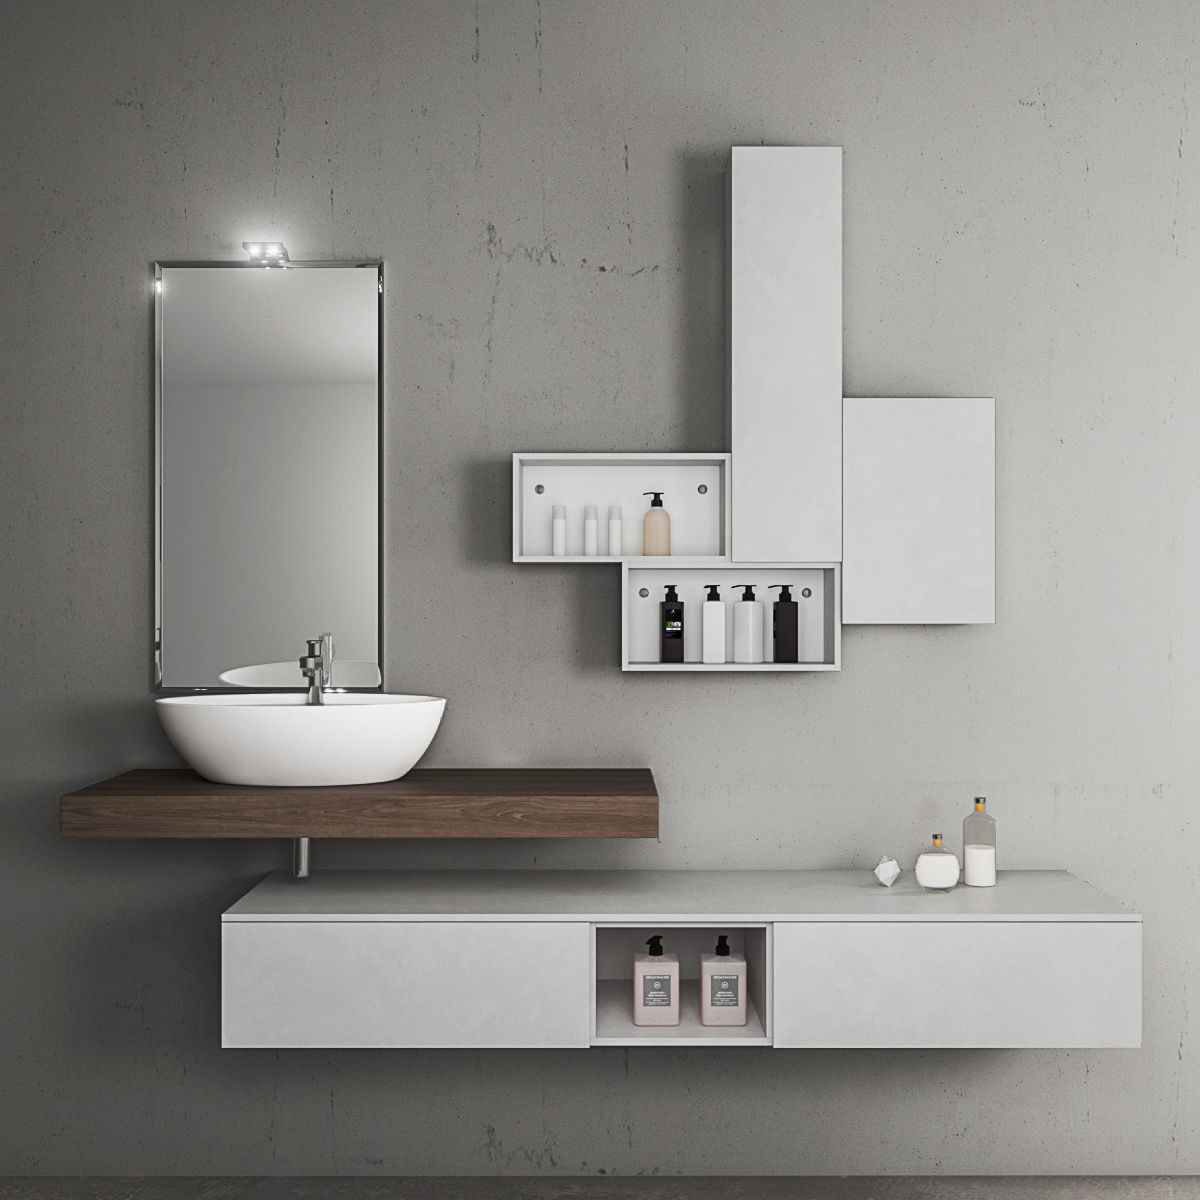 Bathroom furniture set Arcom eLy 3D | CGTrader